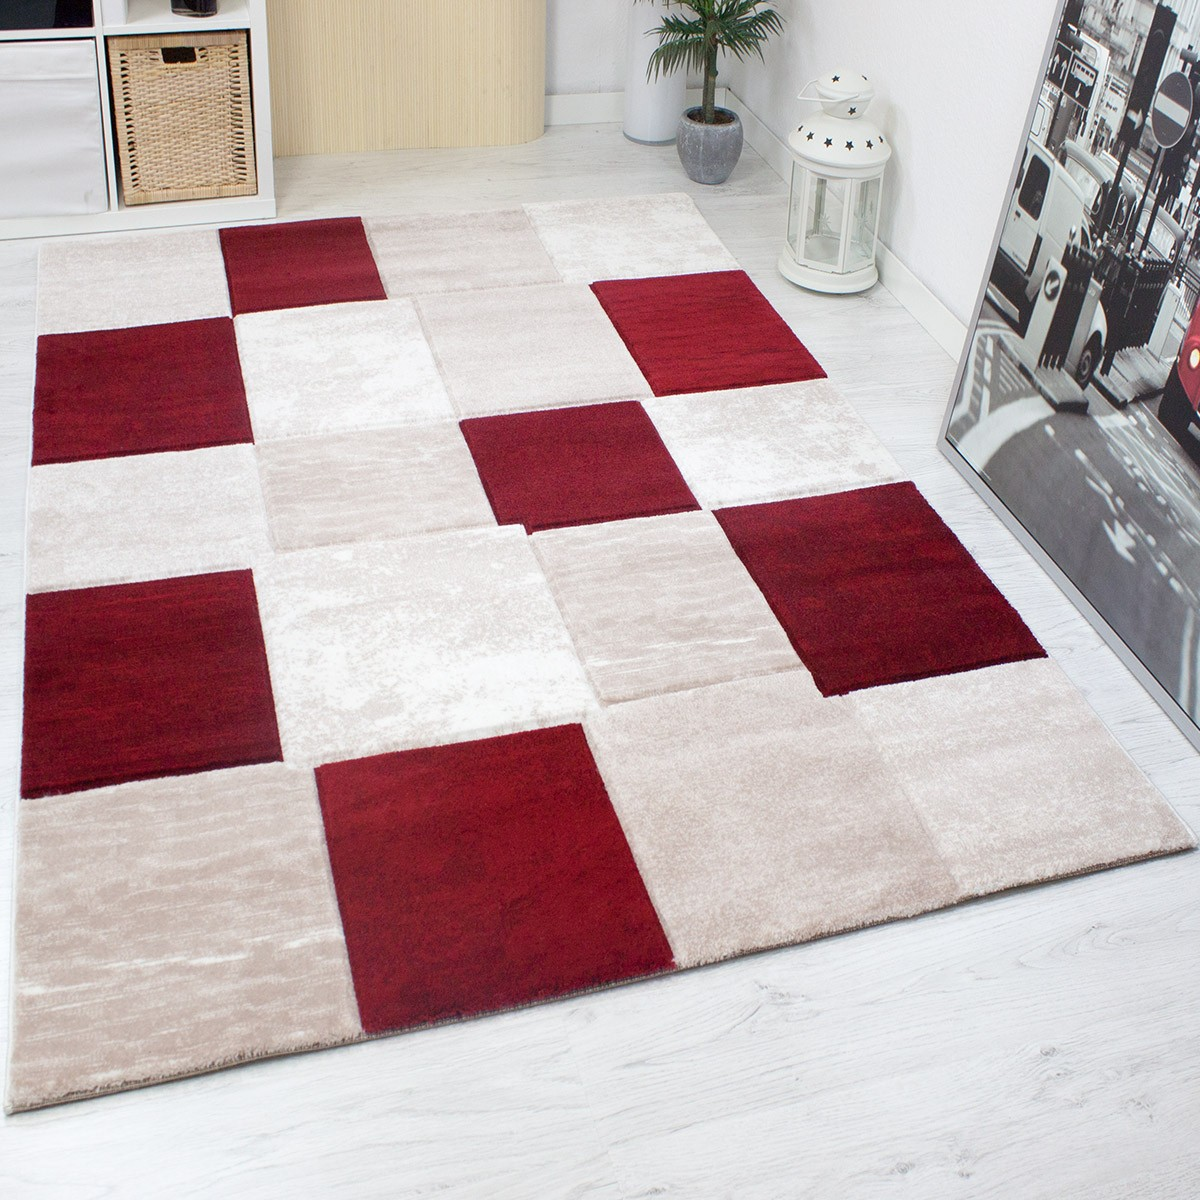 teppich modern designer klassik kariert meliert in braun. Black Bedroom Furniture Sets. Home Design Ideas